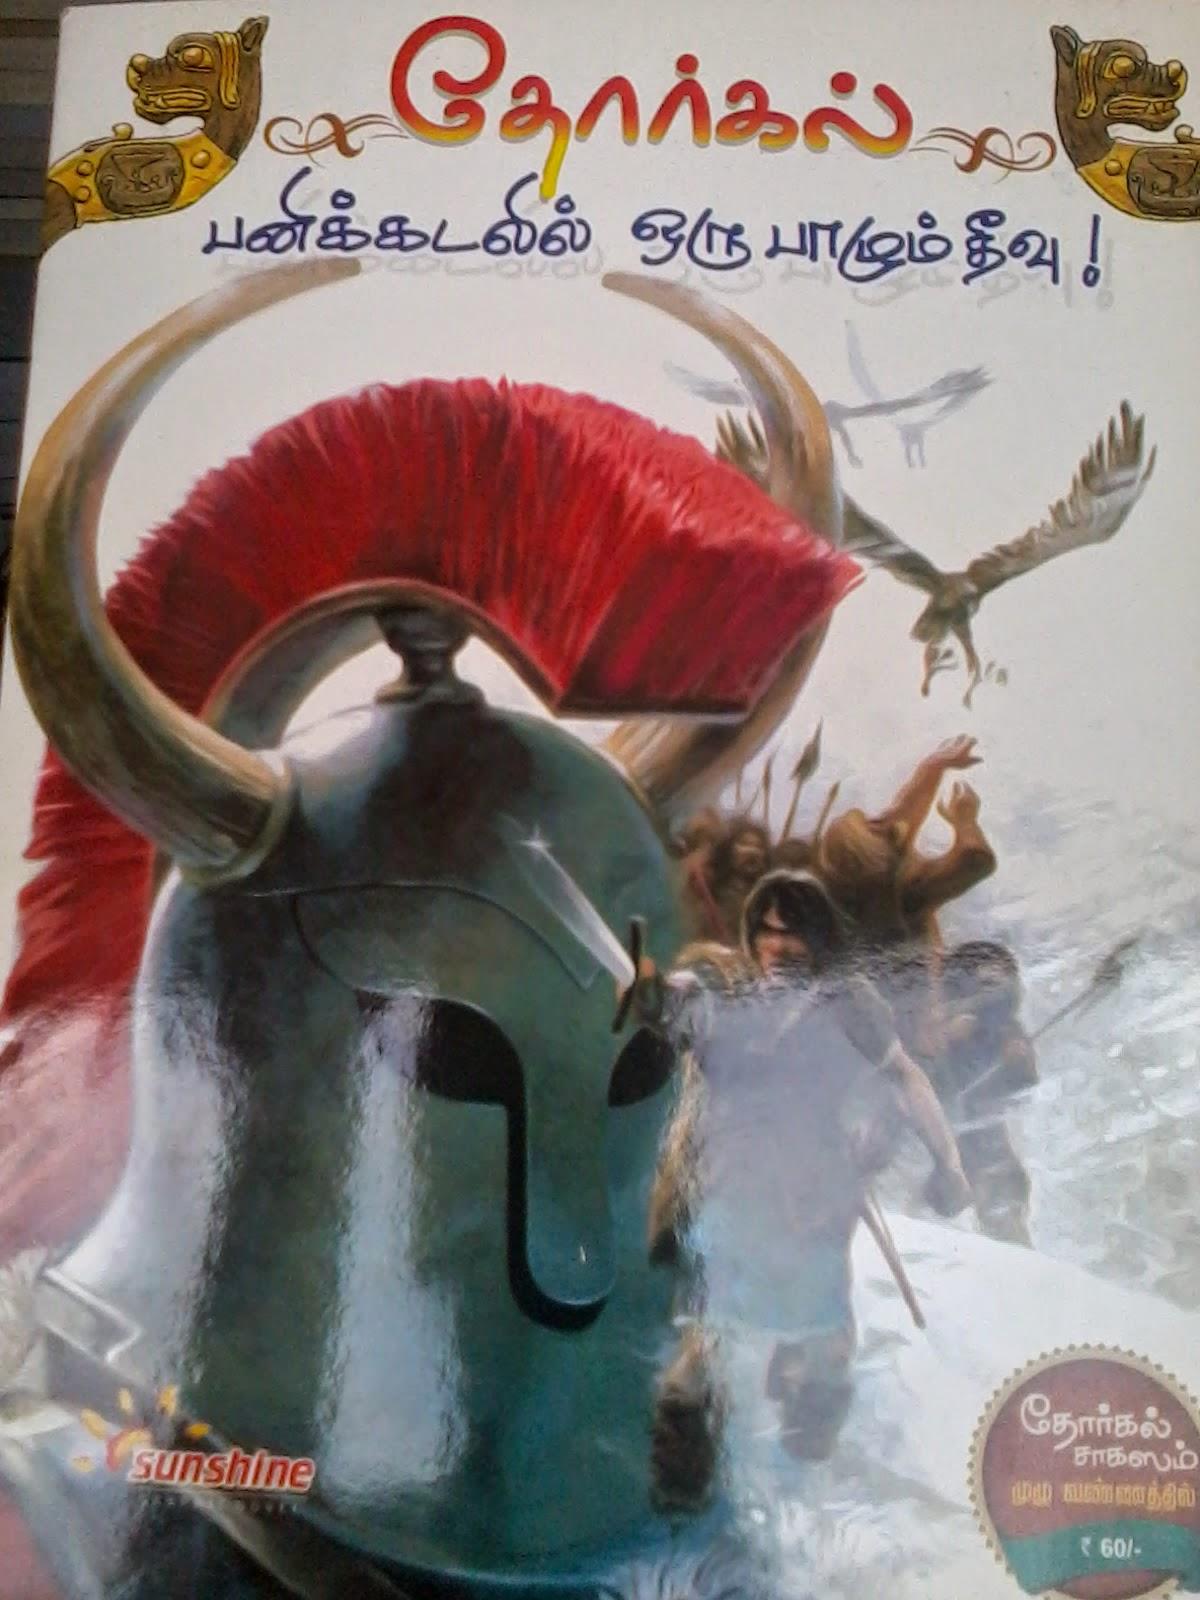 Thorkkal-Panikadalil Oru Paazhum Theevu